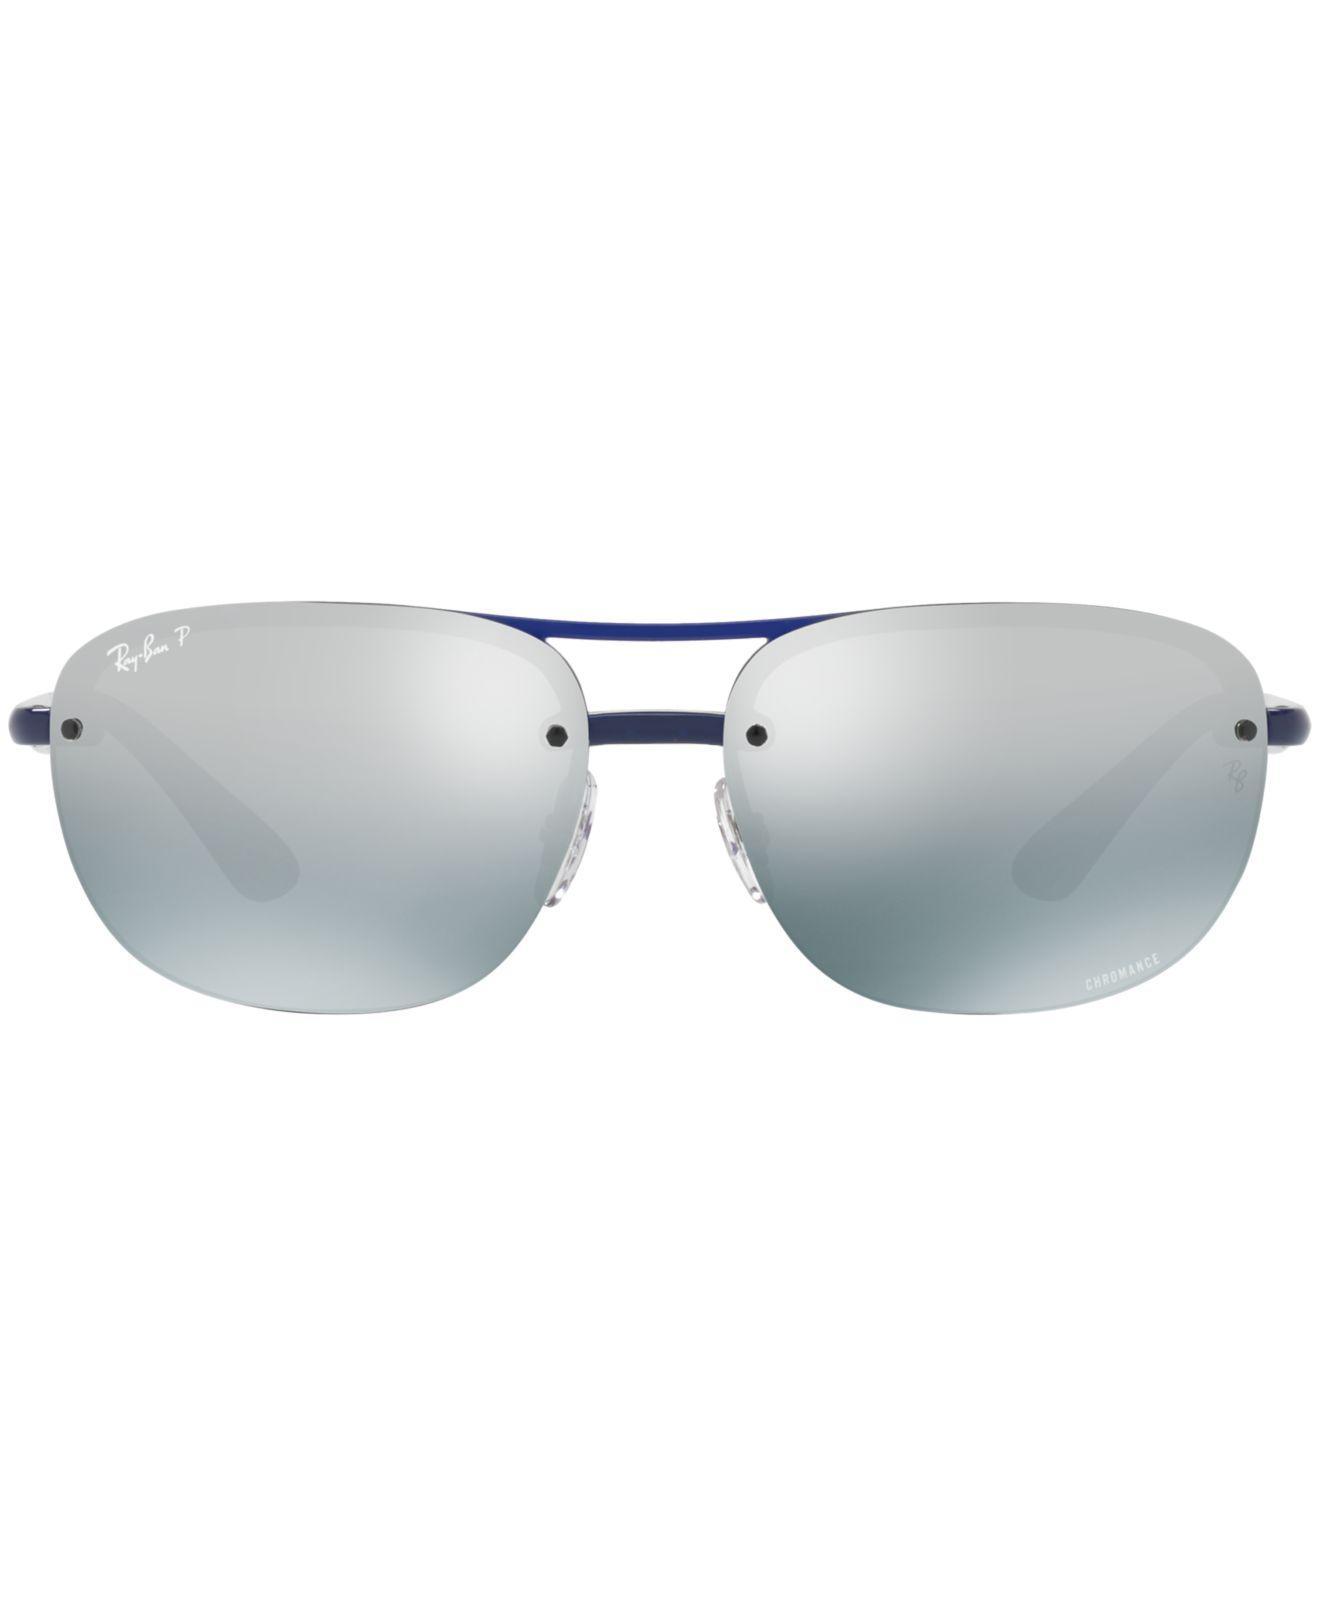 400181b7e8 Lyst - Ray-Ban Polarized Chromance Collection Sunglasses